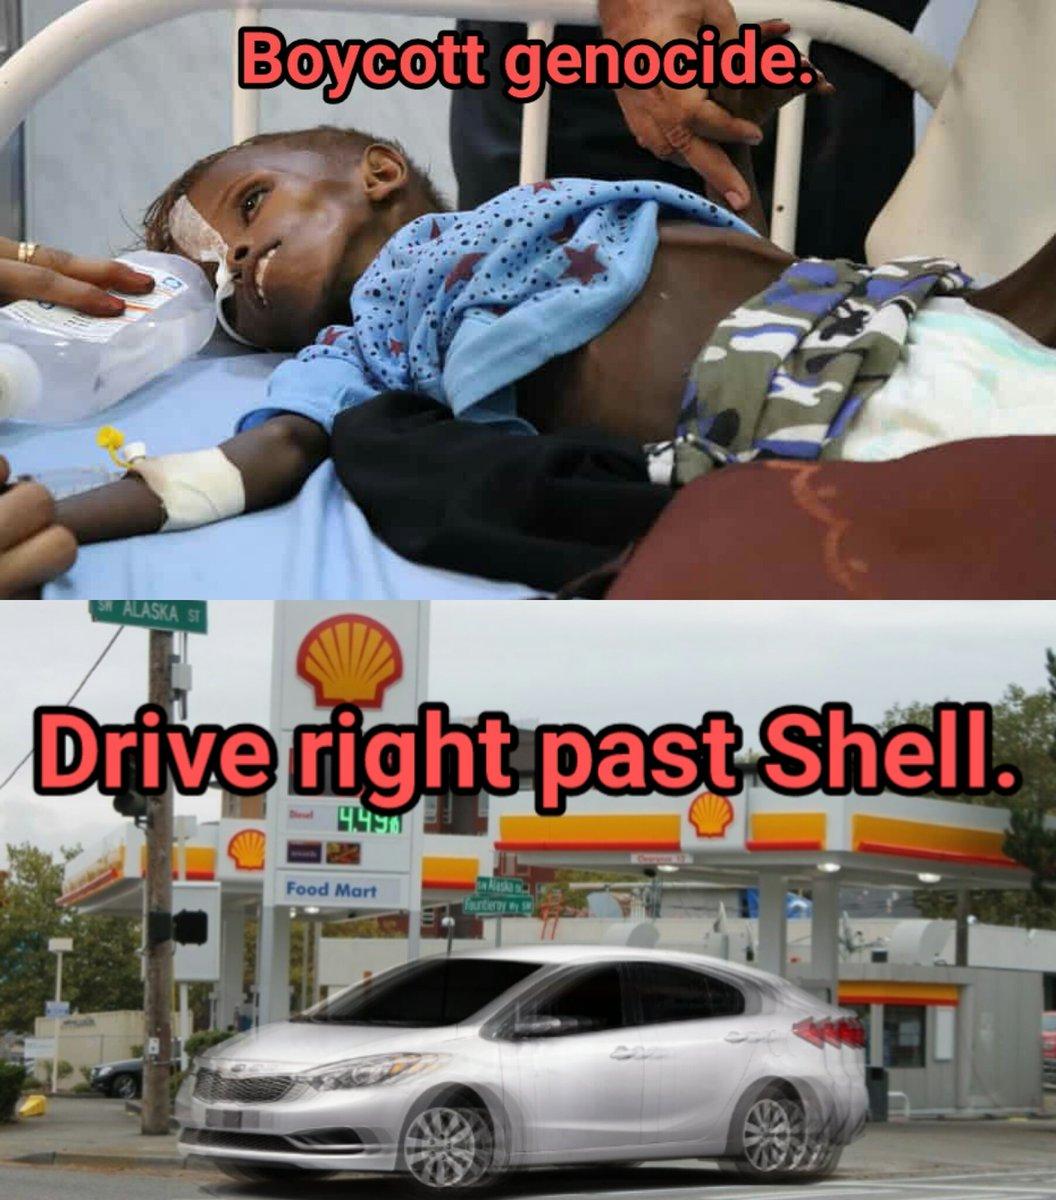 We'll stop kids from starving. #MakeAFri...